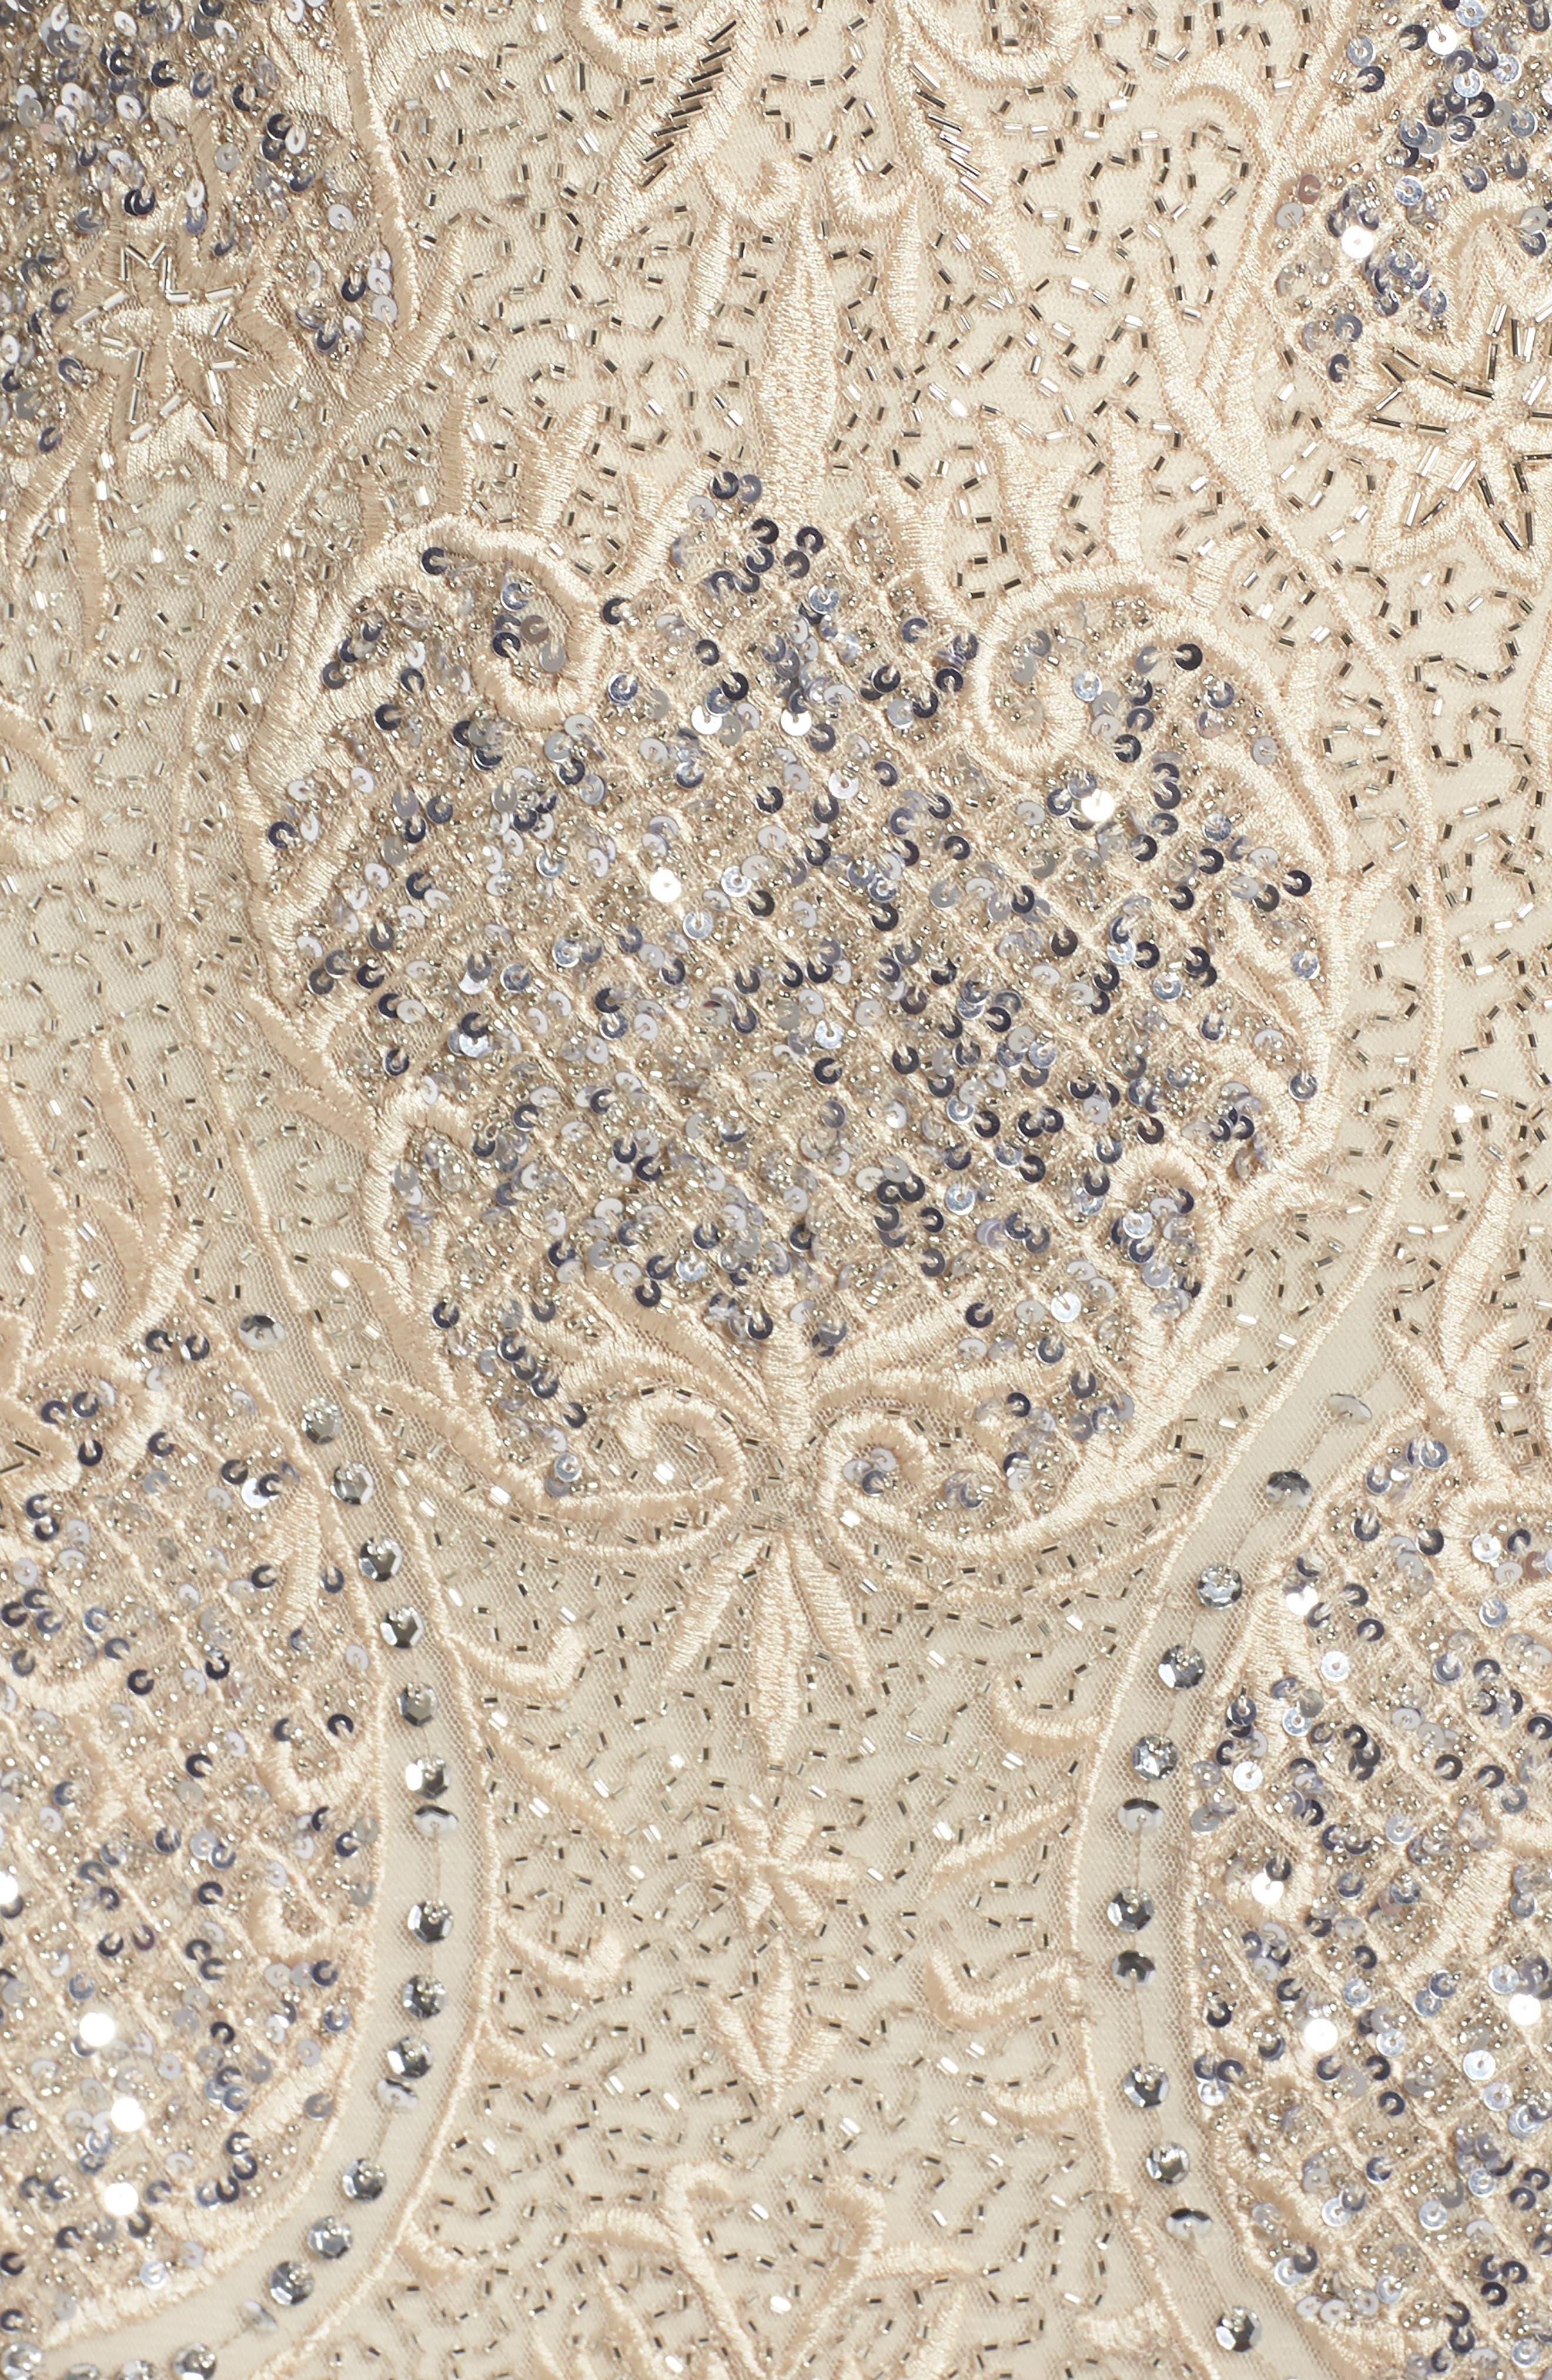 Embroidered Scallop Edge Midi Sheath Dress,                             Alternate thumbnail 5, color,                             Champagne